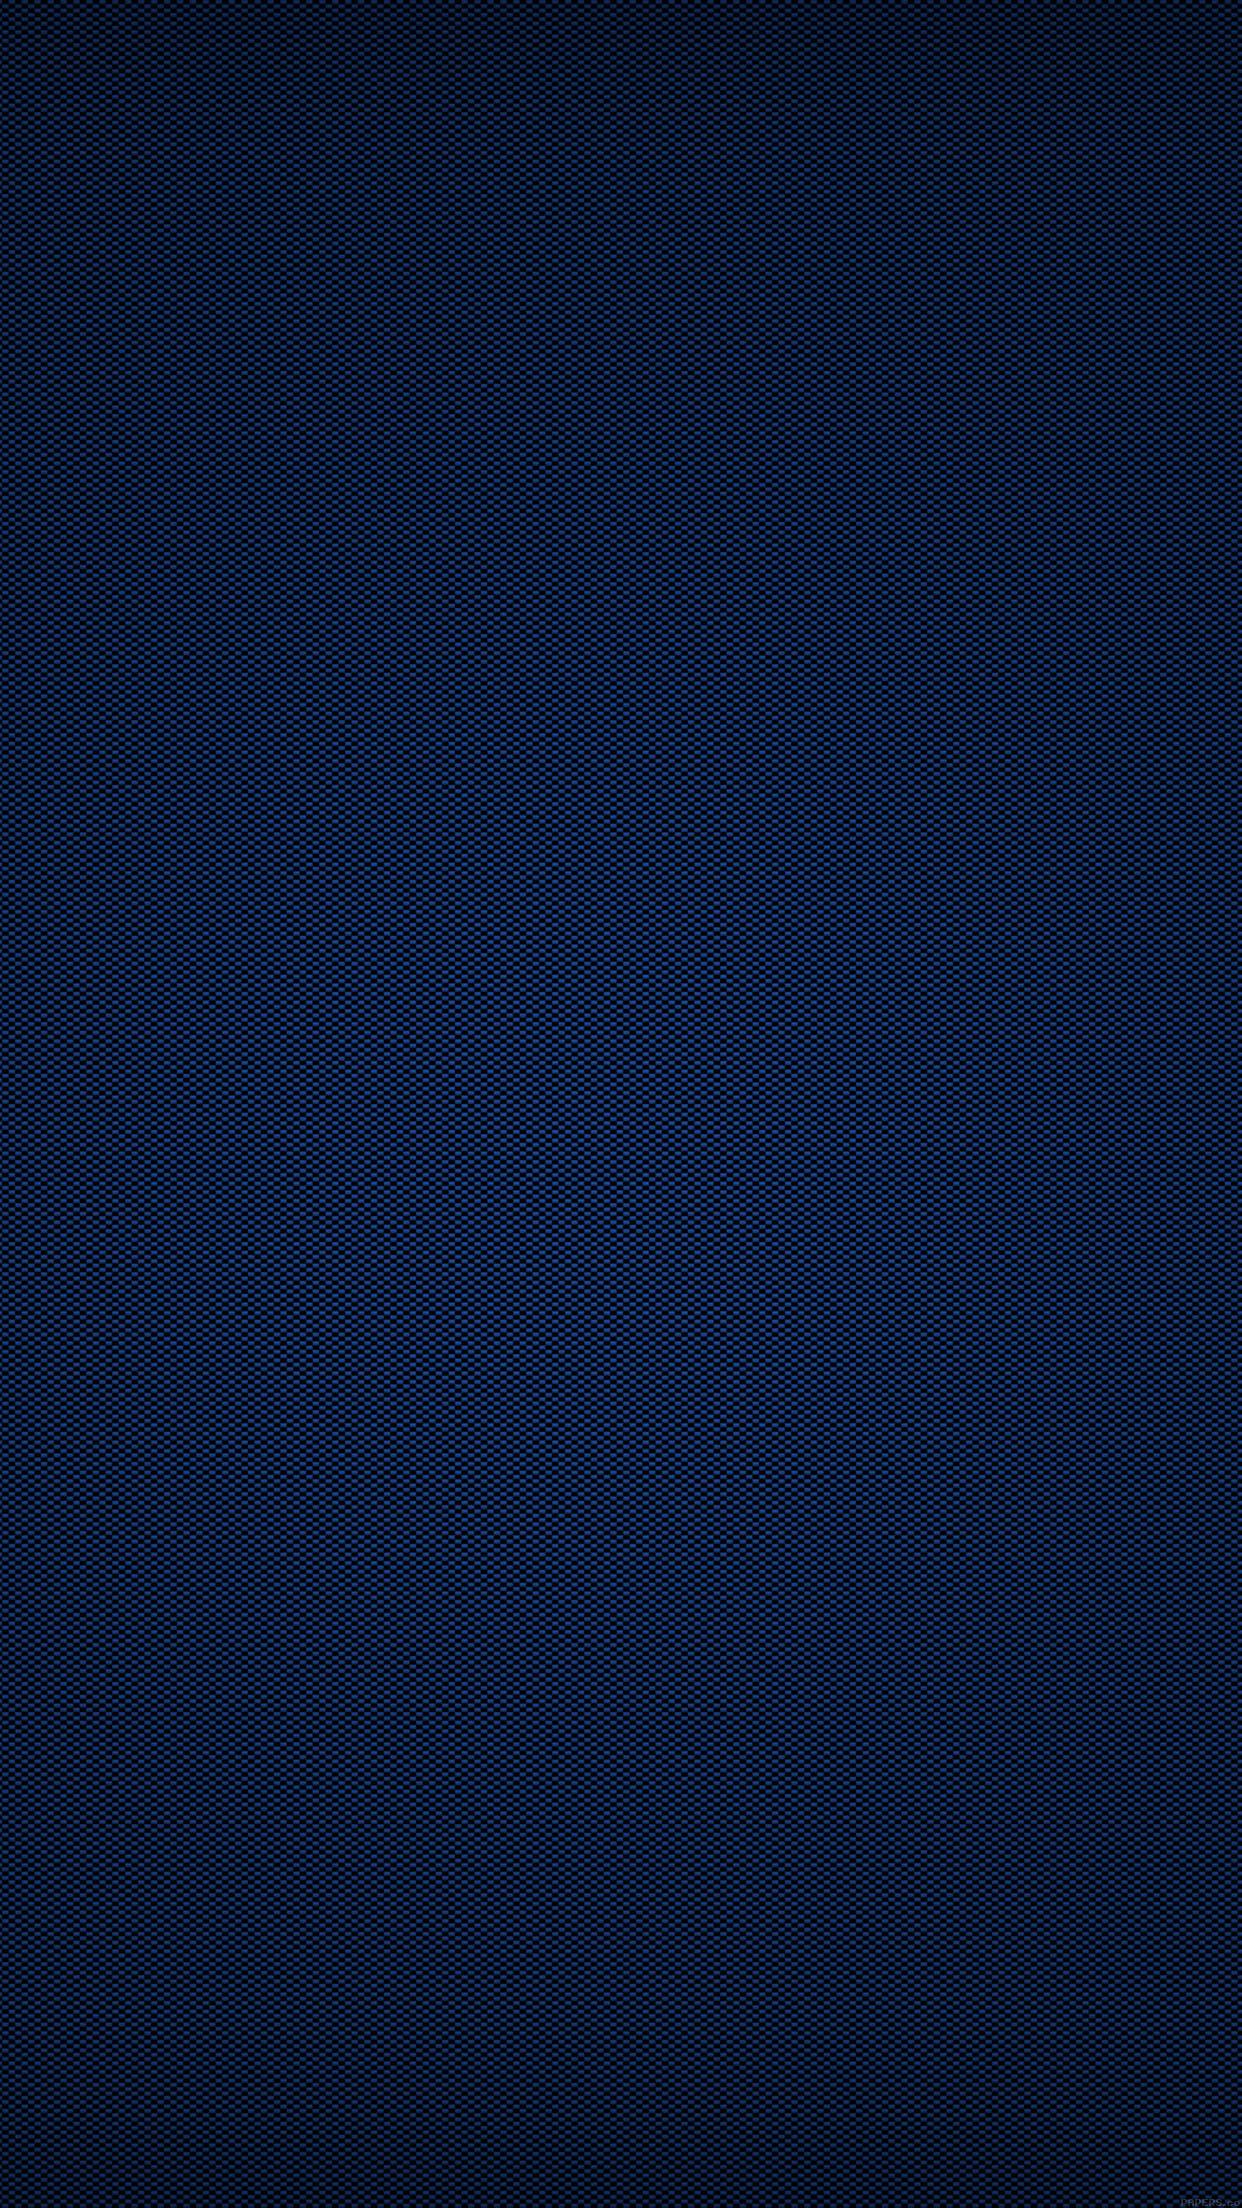 desktop backgrounds for macbook air